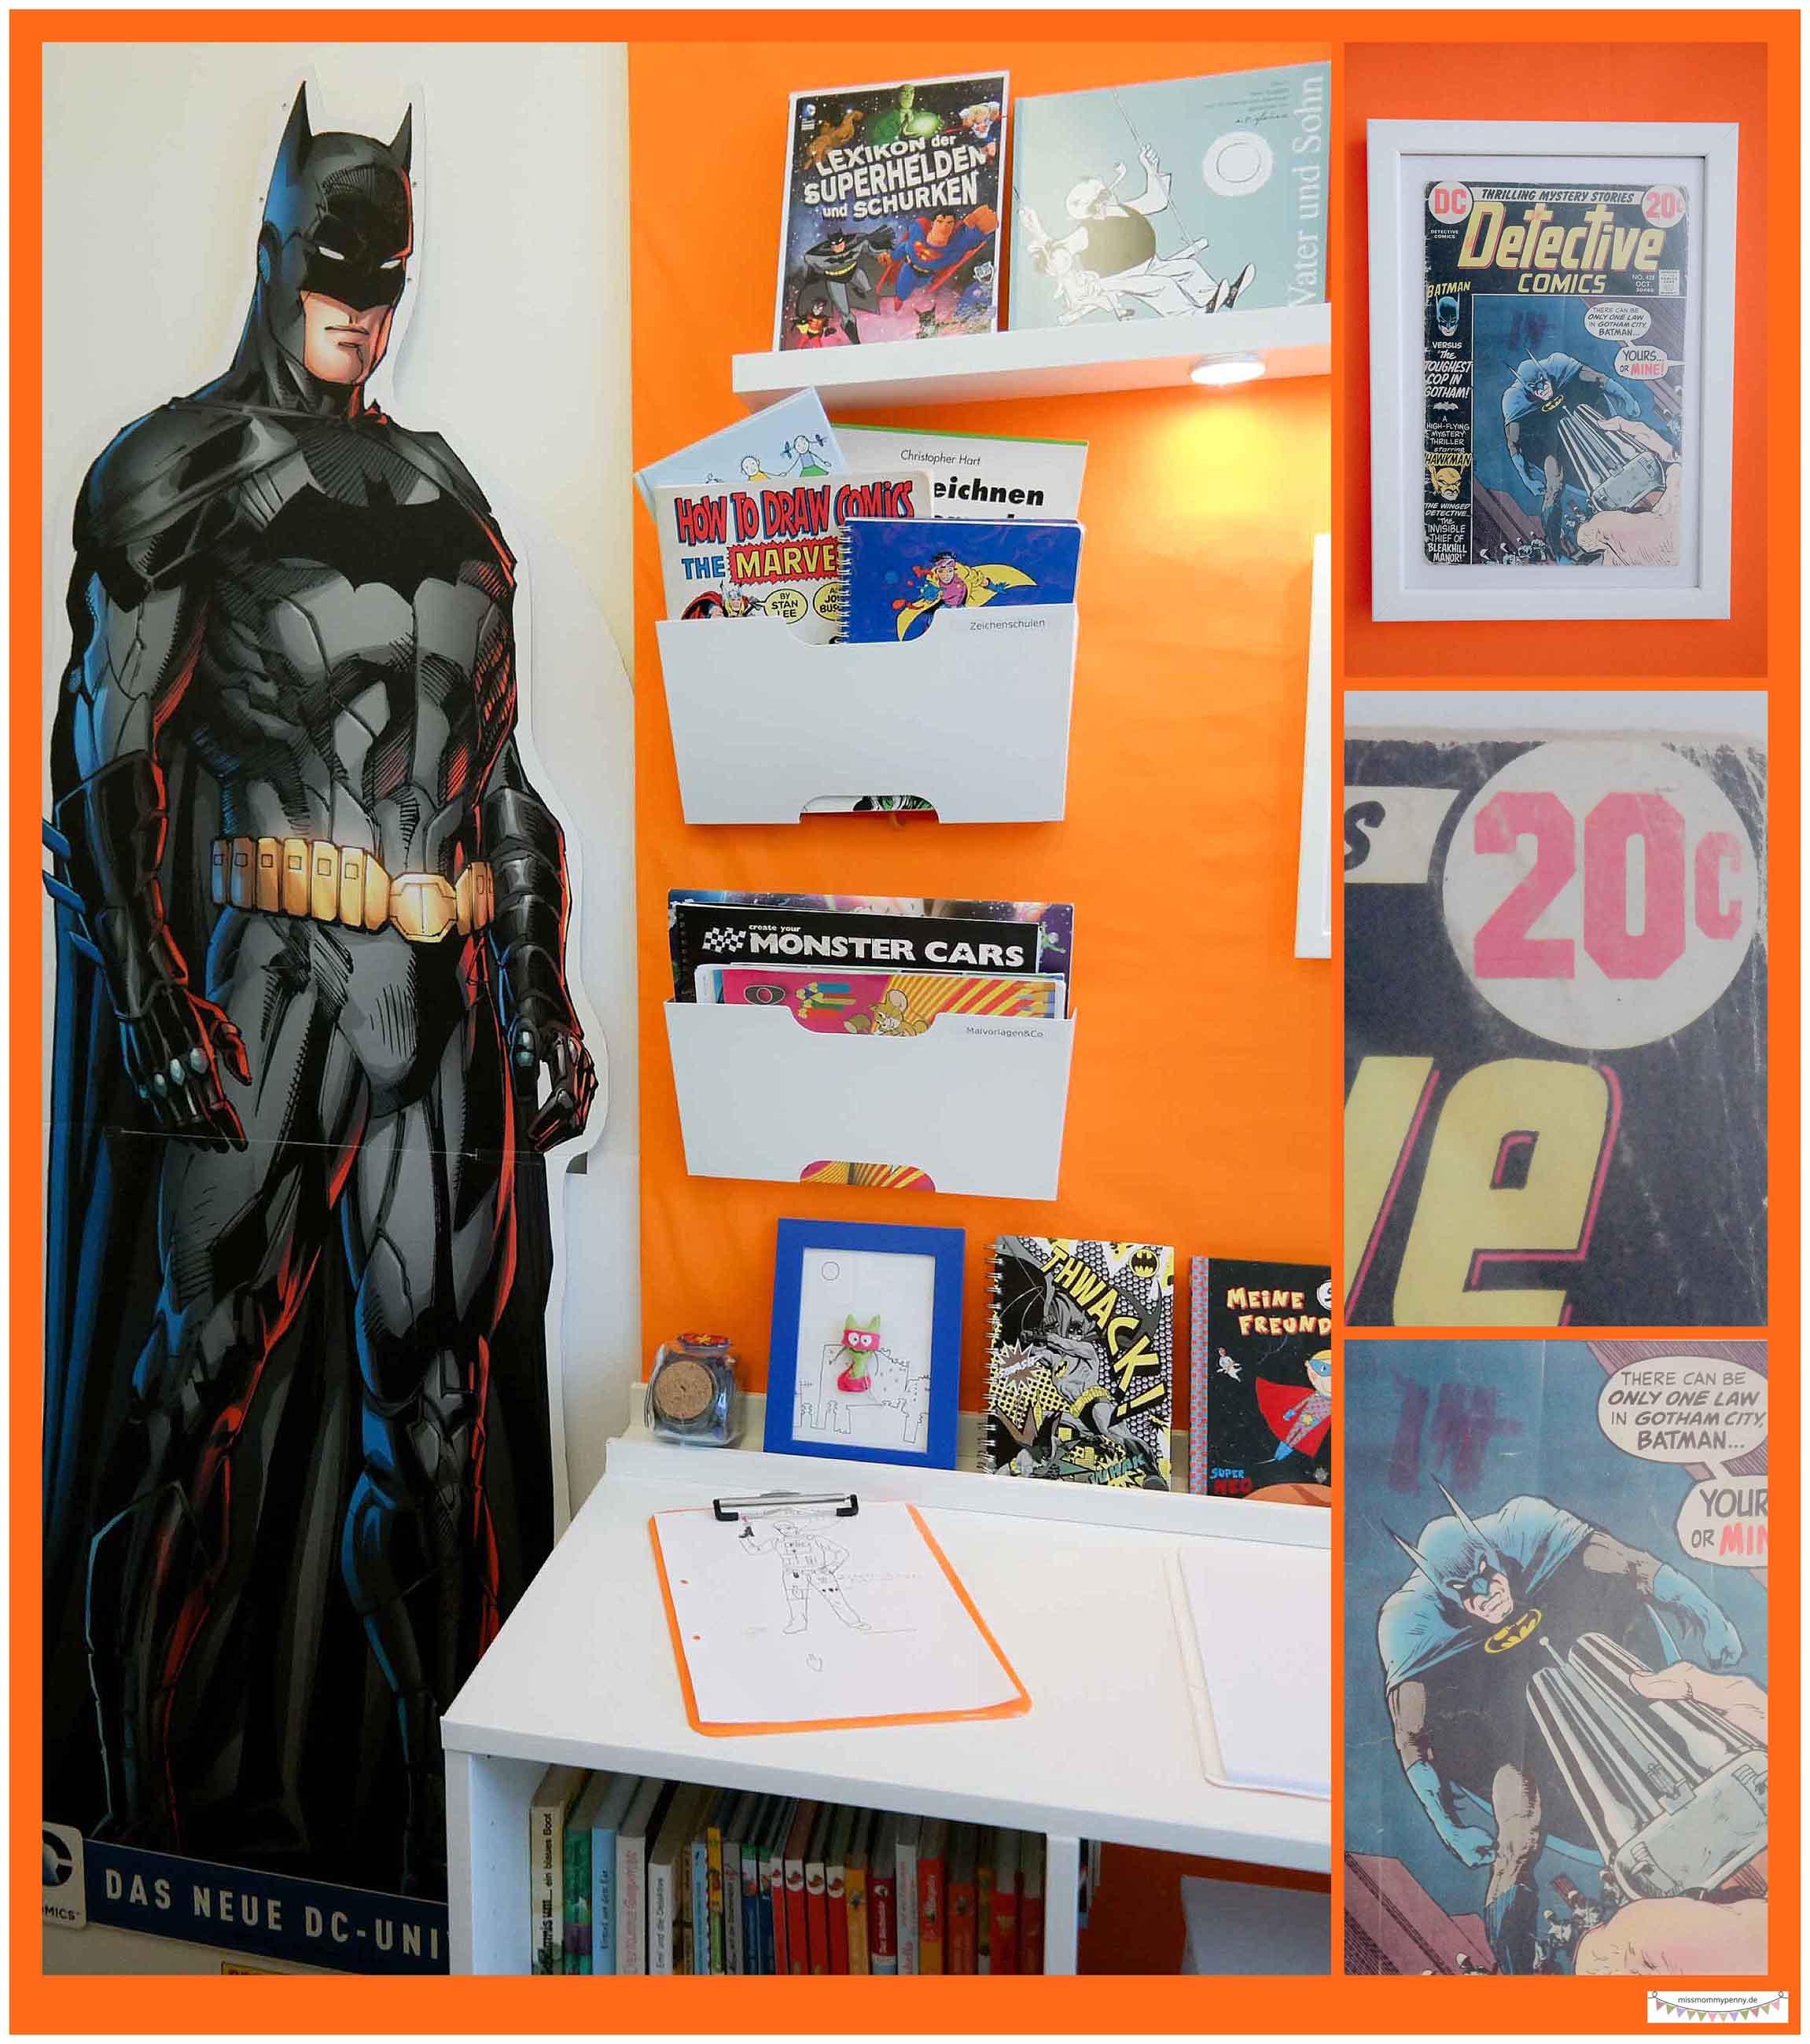 Batman Zimmer Dekotration